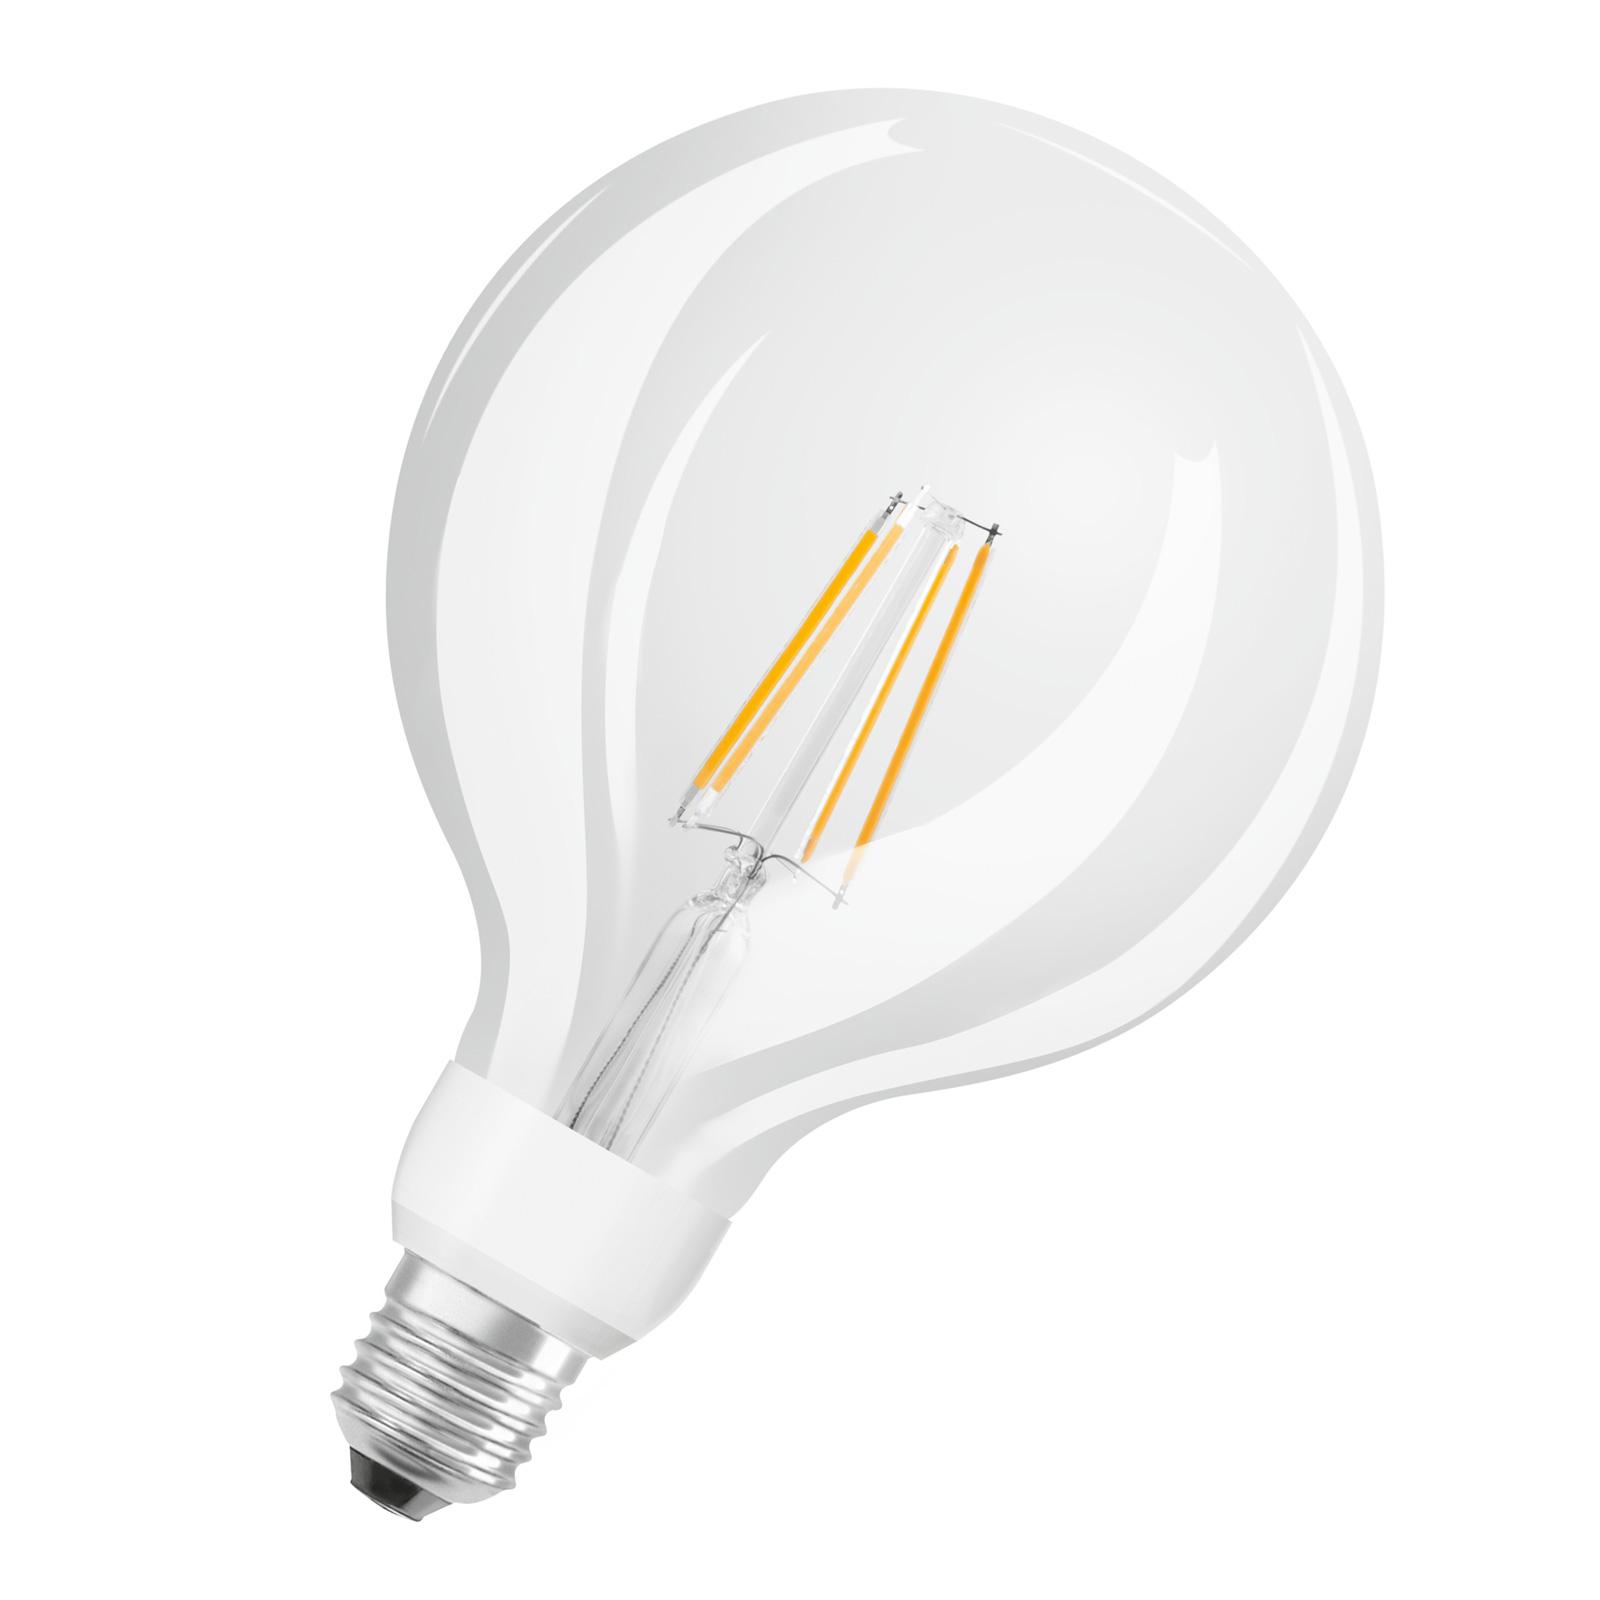 OSRAM LED-Globelampe E27 7W G125 827 Glow dim